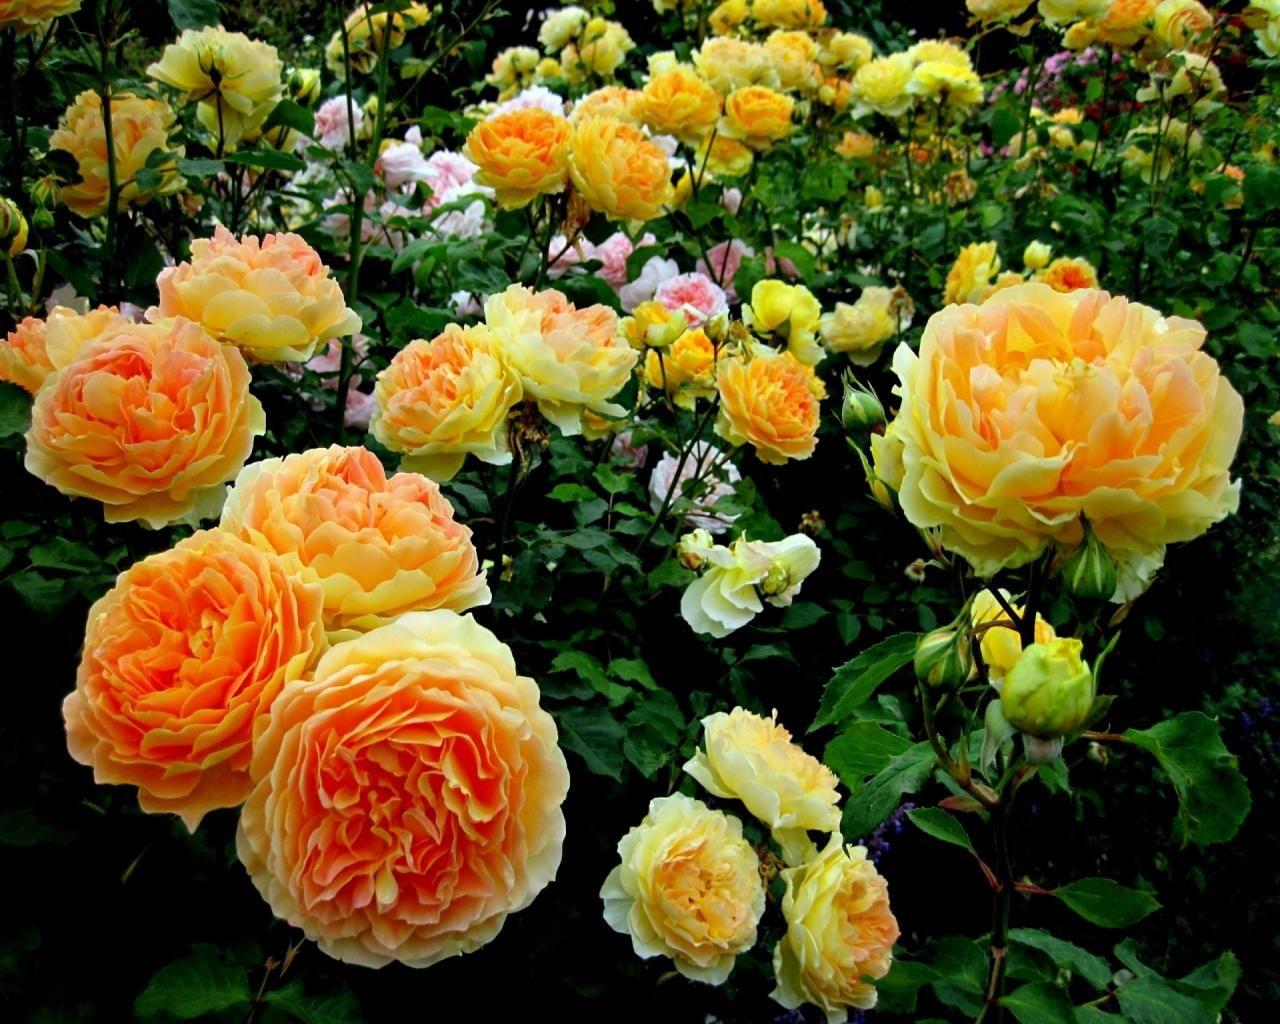 Rose flower garden pictures - Rose Flower Garden